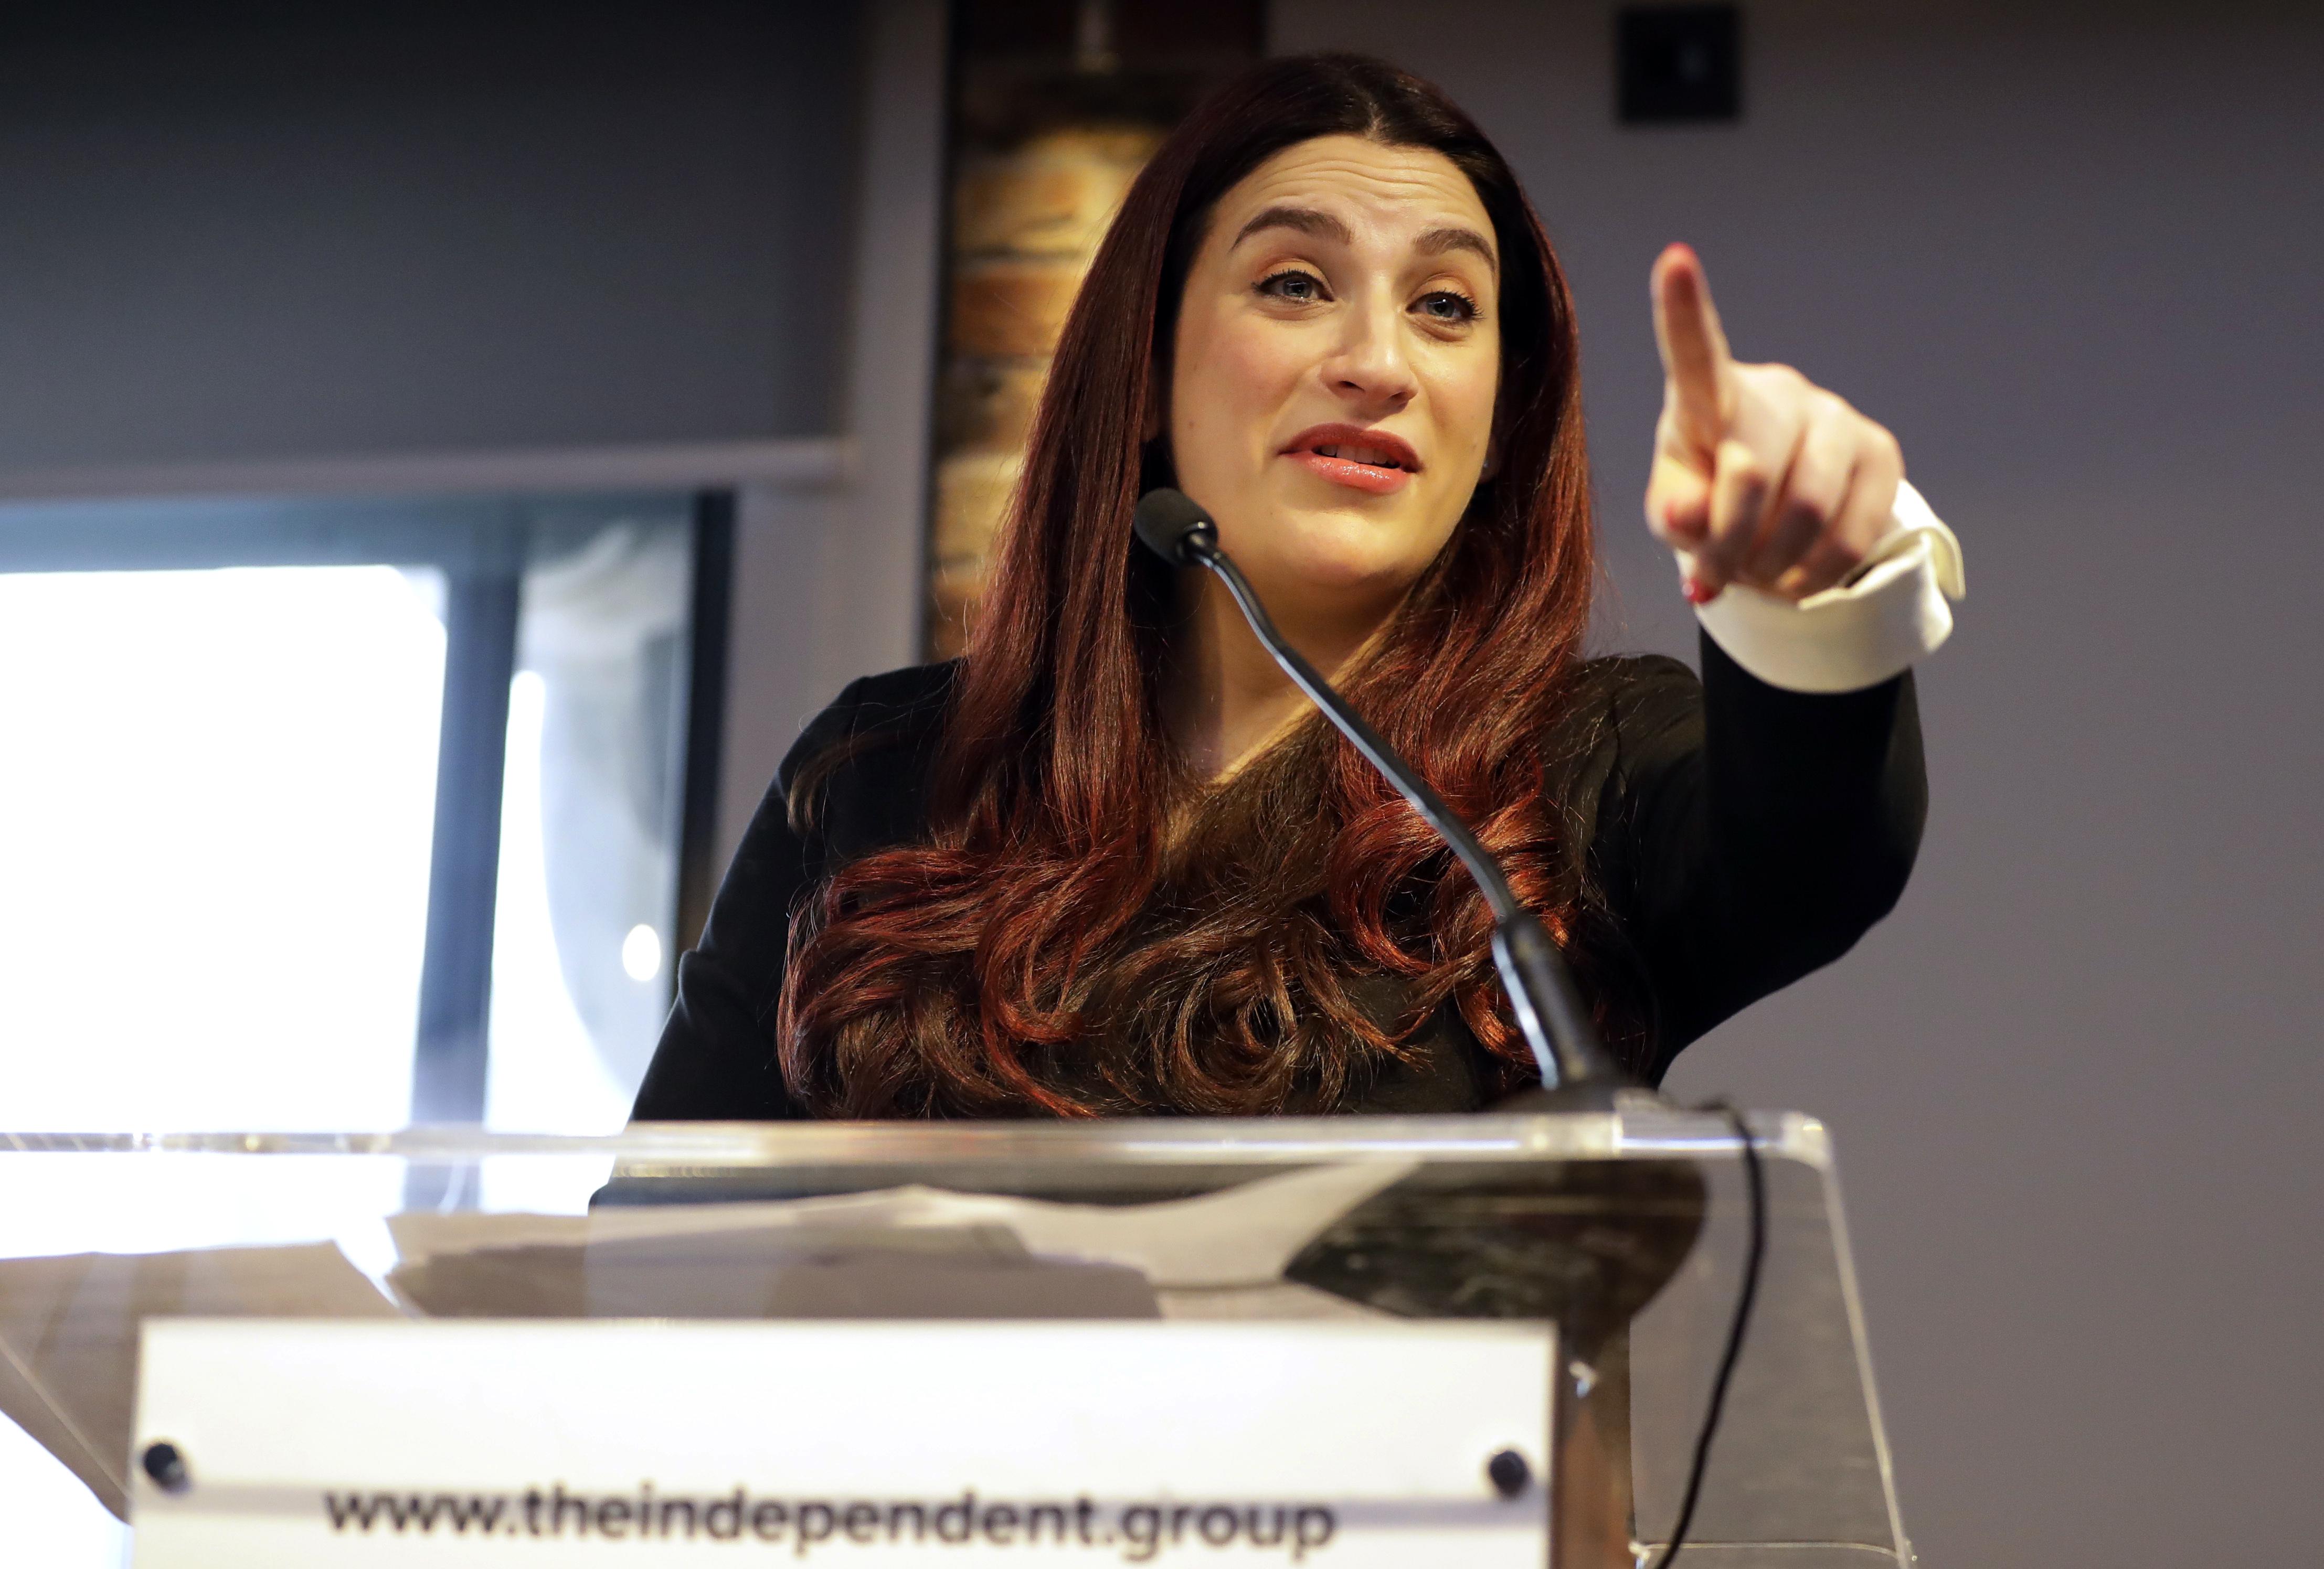 7 MPs quit Labour Party over EU, anti-Semitism